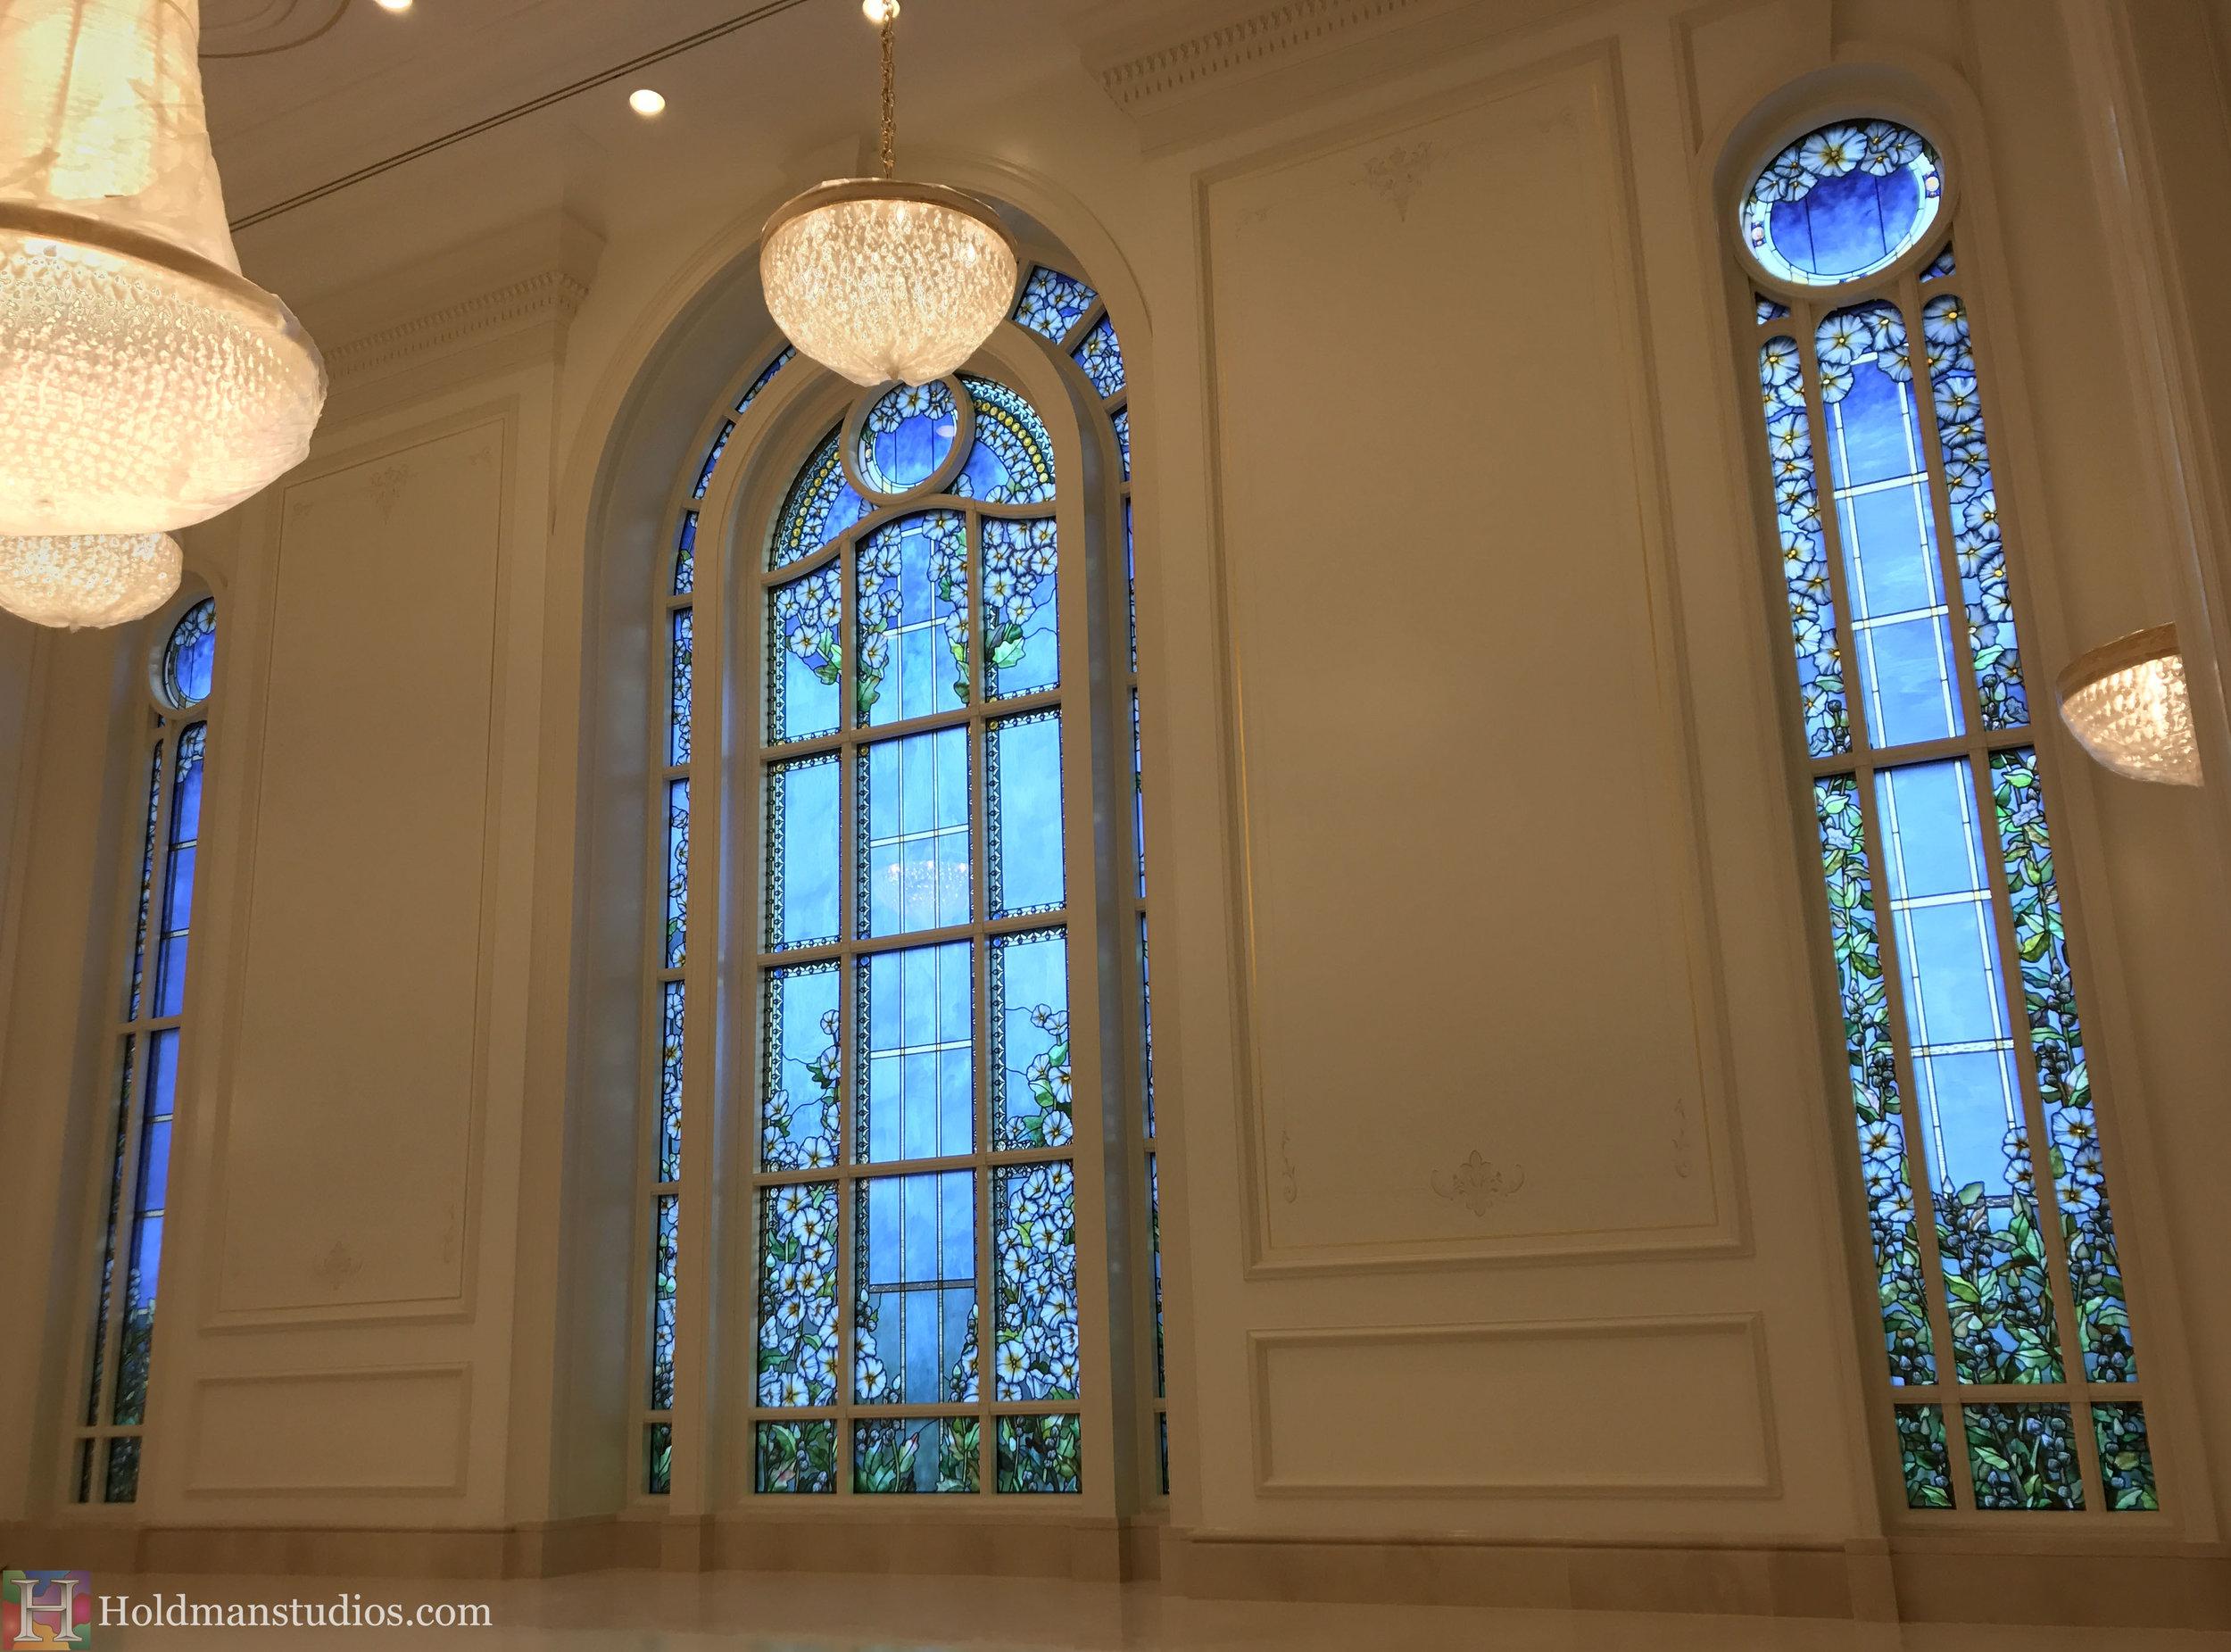 Holdman-Studios-Paris-LDS-Temple-Stained-Glass-Madonna-Cornflower-Blue-Lily-Flowers-Leaves-Sun-Windows-Chandeliers.jpg